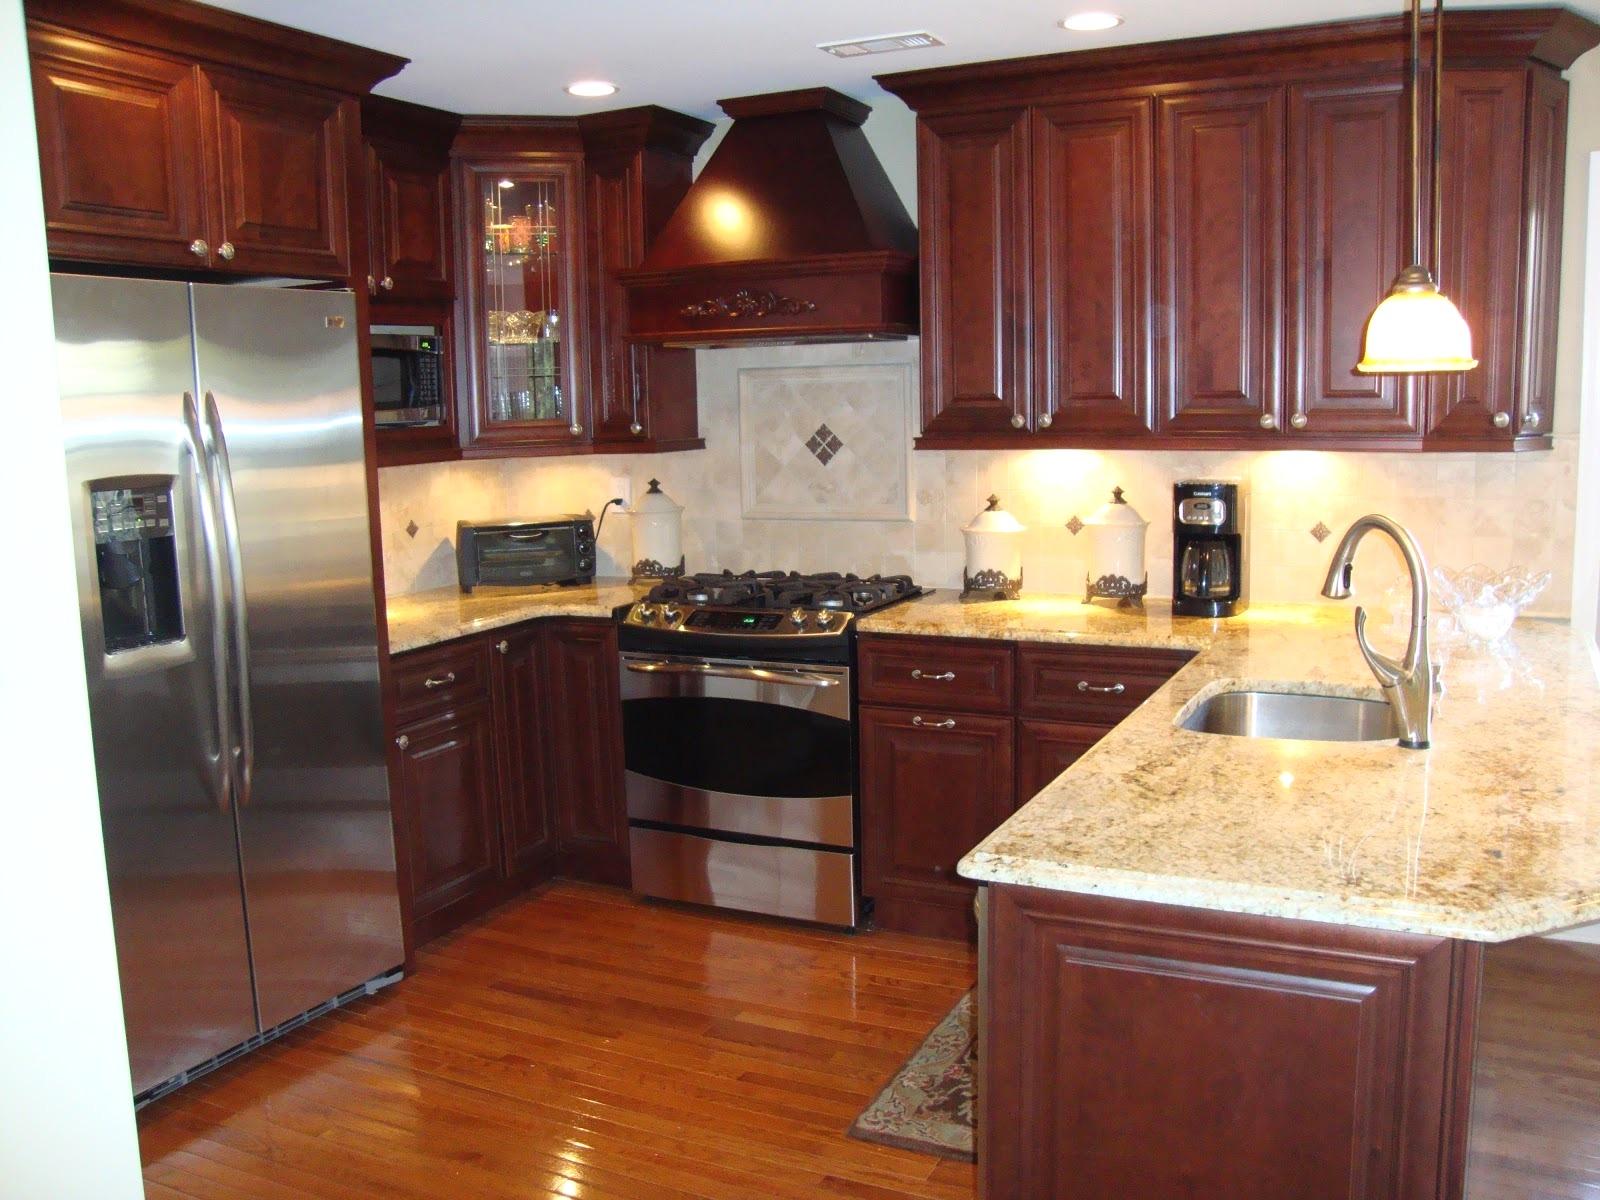 بالصور مطابخ خشب , مطابخ خشبية ذات رونق خاص اصنعي منها مطبخك 5067 8